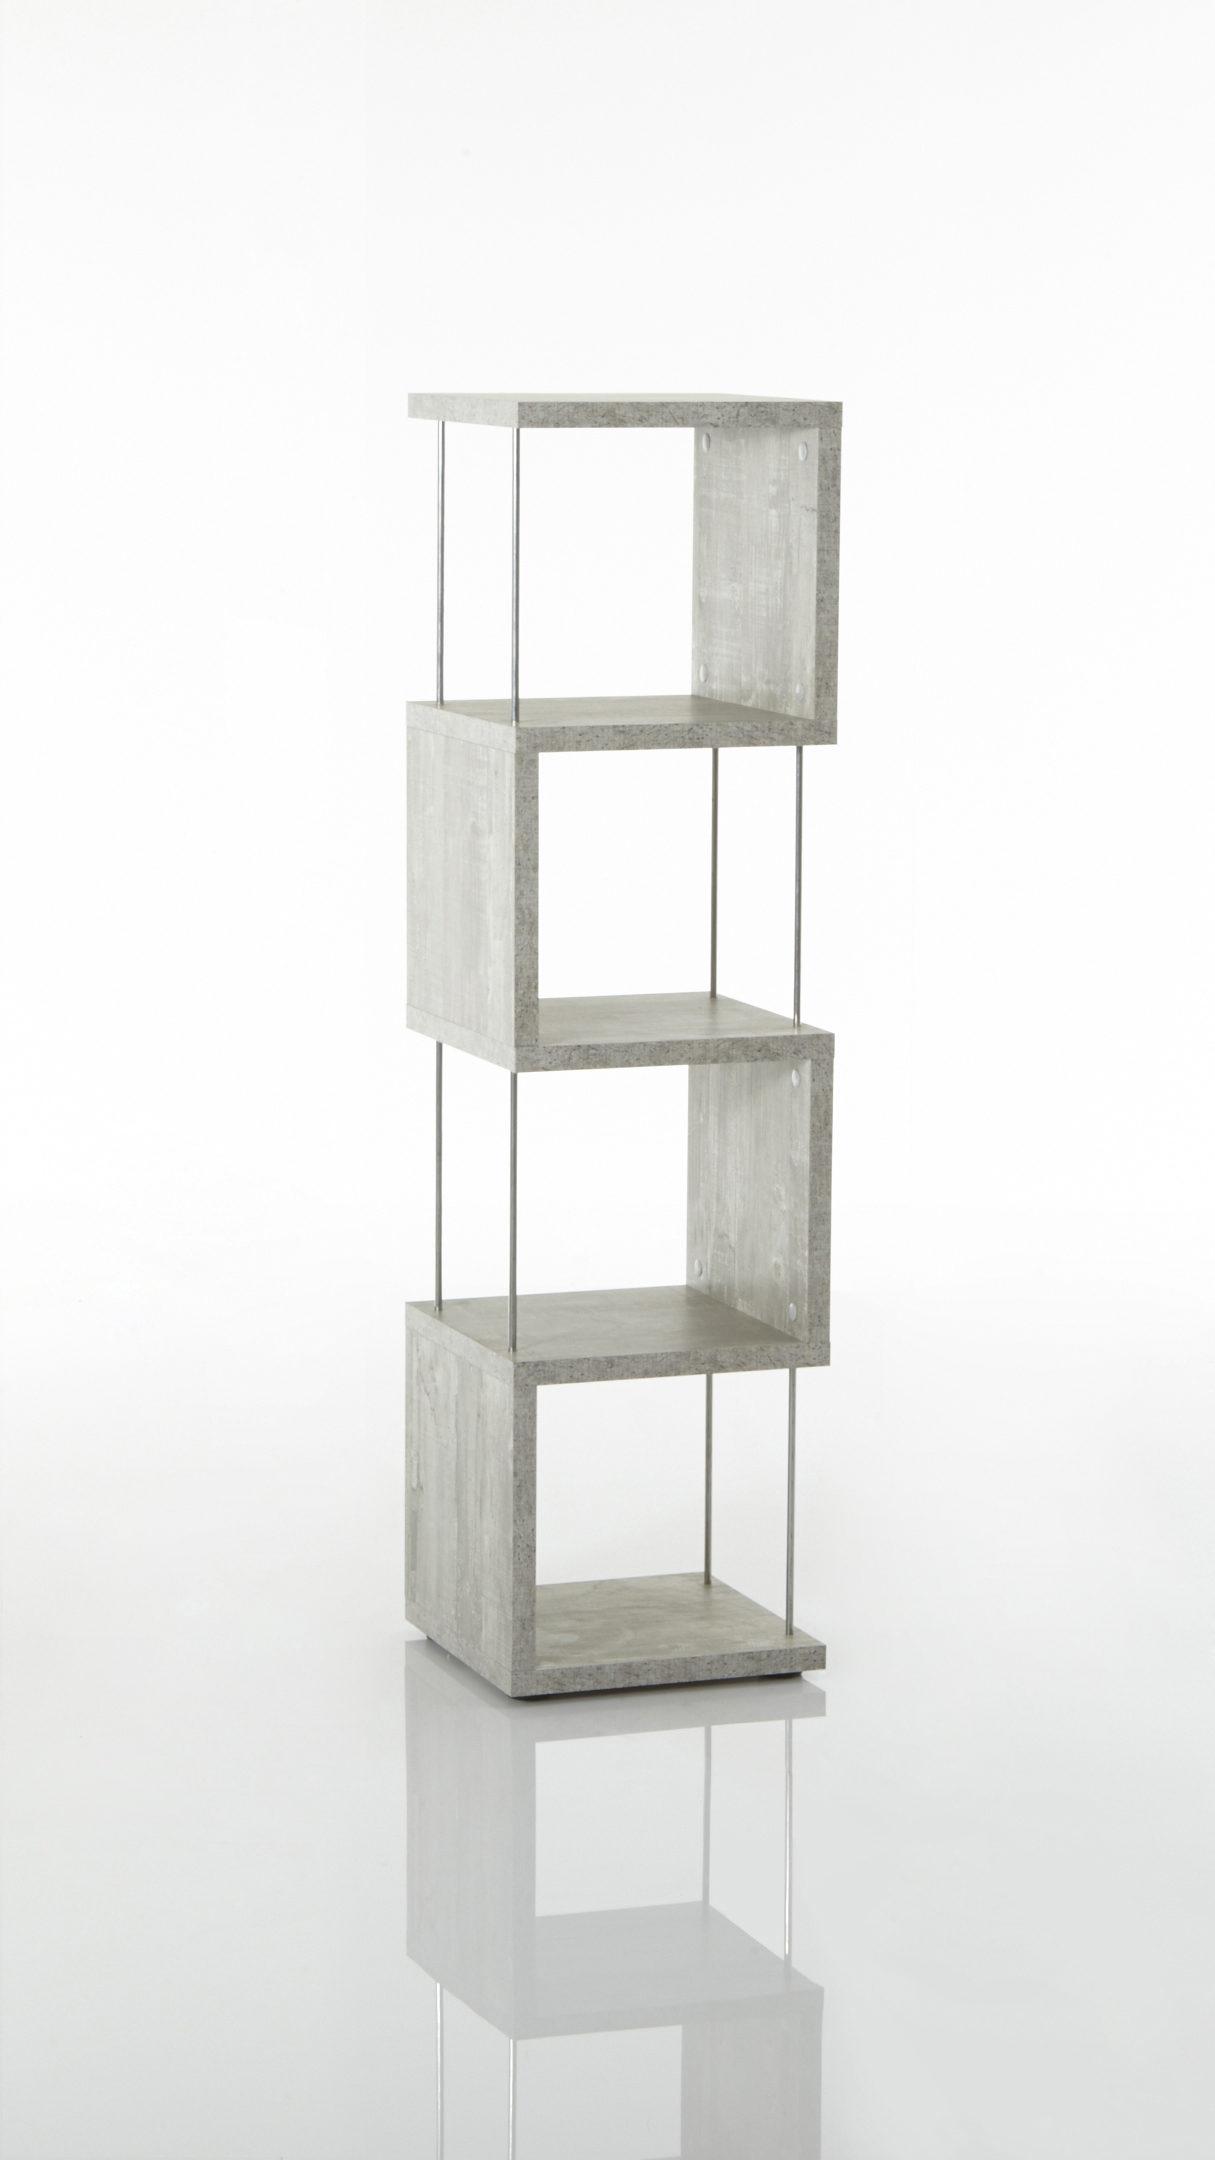 schmales Regal im String-Look bzw. Bücherregal, betonfarbene  Kunststoffoberflächen - ca. 33 x 126 x 33 cm